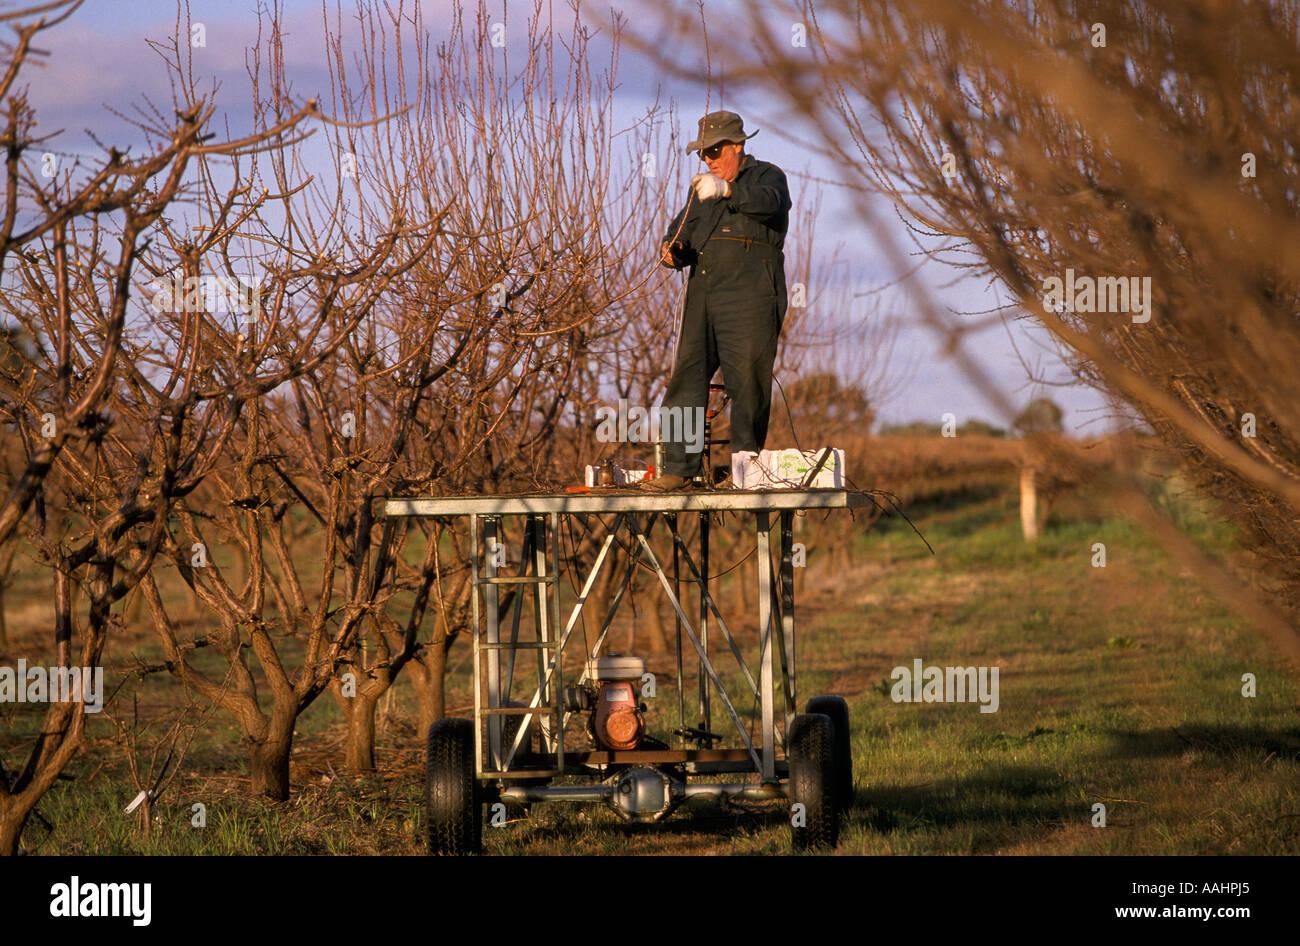 Pruning Apricot Trees Near Mildura Victoria Australia Stock Photo Alamy